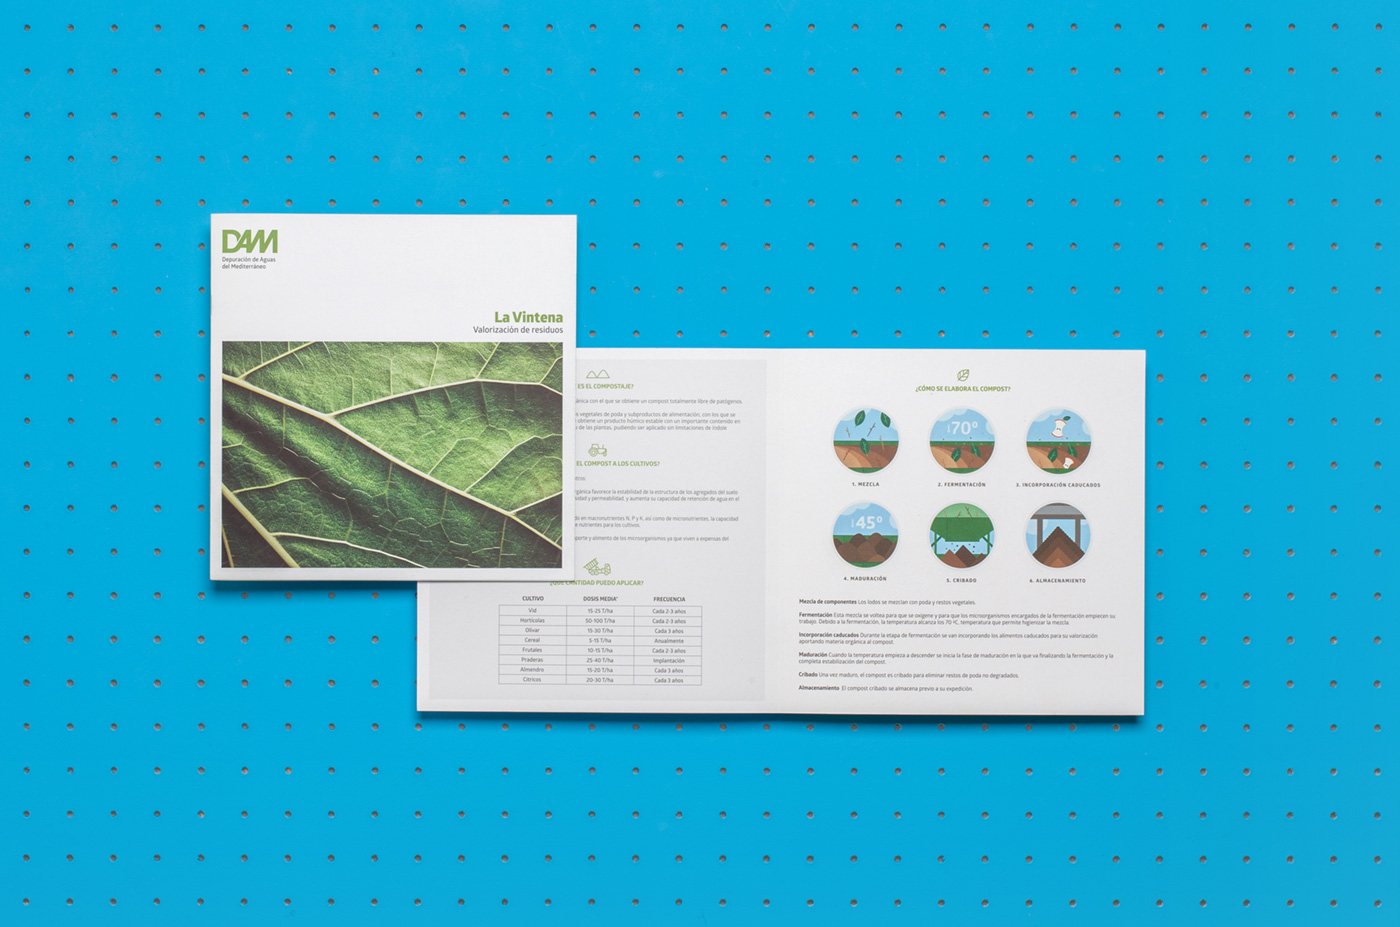 pixelarte-diseno-grafico-papeleria-folleto-Dam_Depuracion_Aguas_Mediterraneo